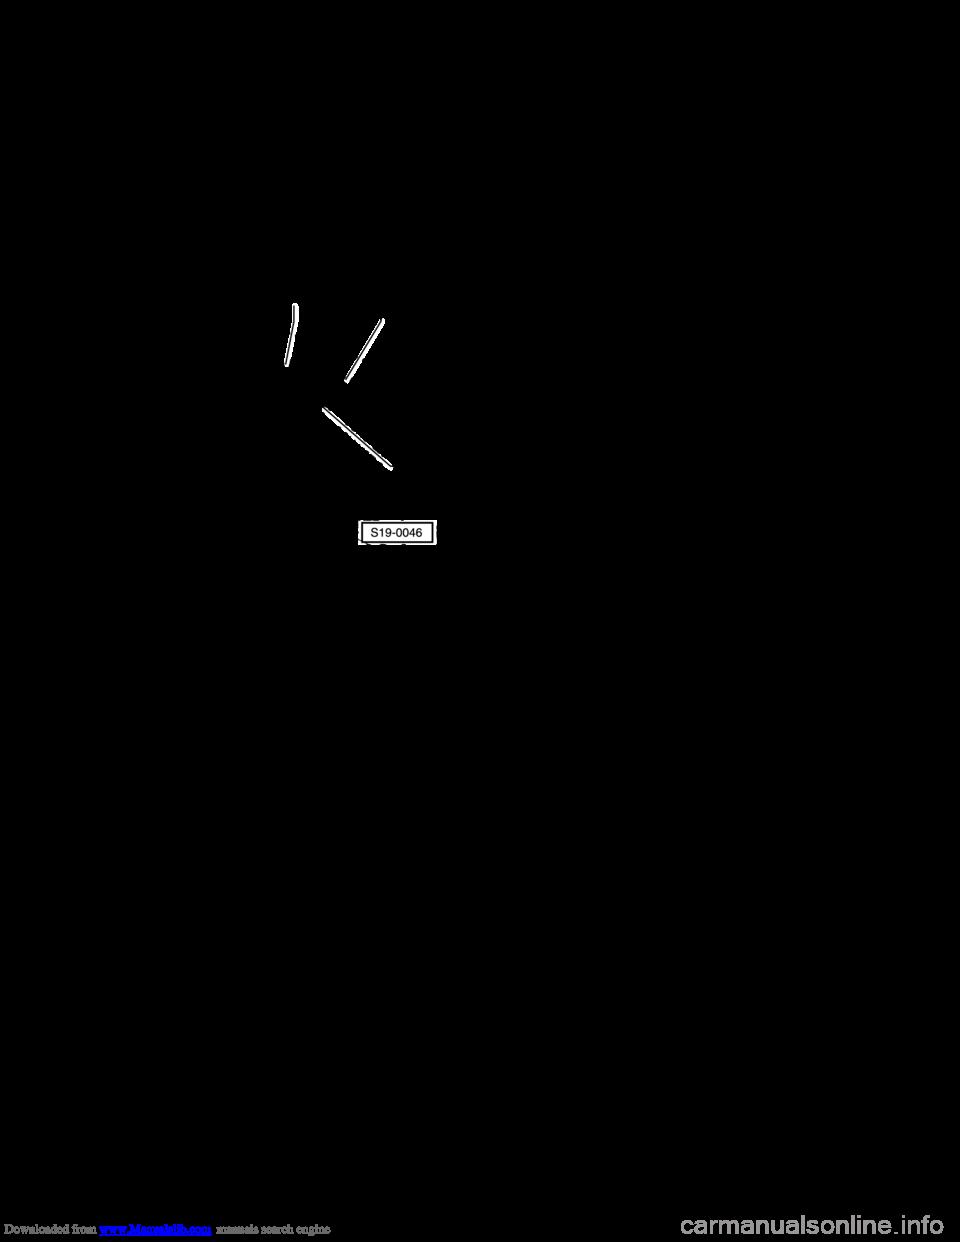 Skoda Octavia 1 9 Tdi Wiring Diagram Detailed Schematics Engine Diagrams 1999 G 1u 9tdi 66kw Workshop Manual